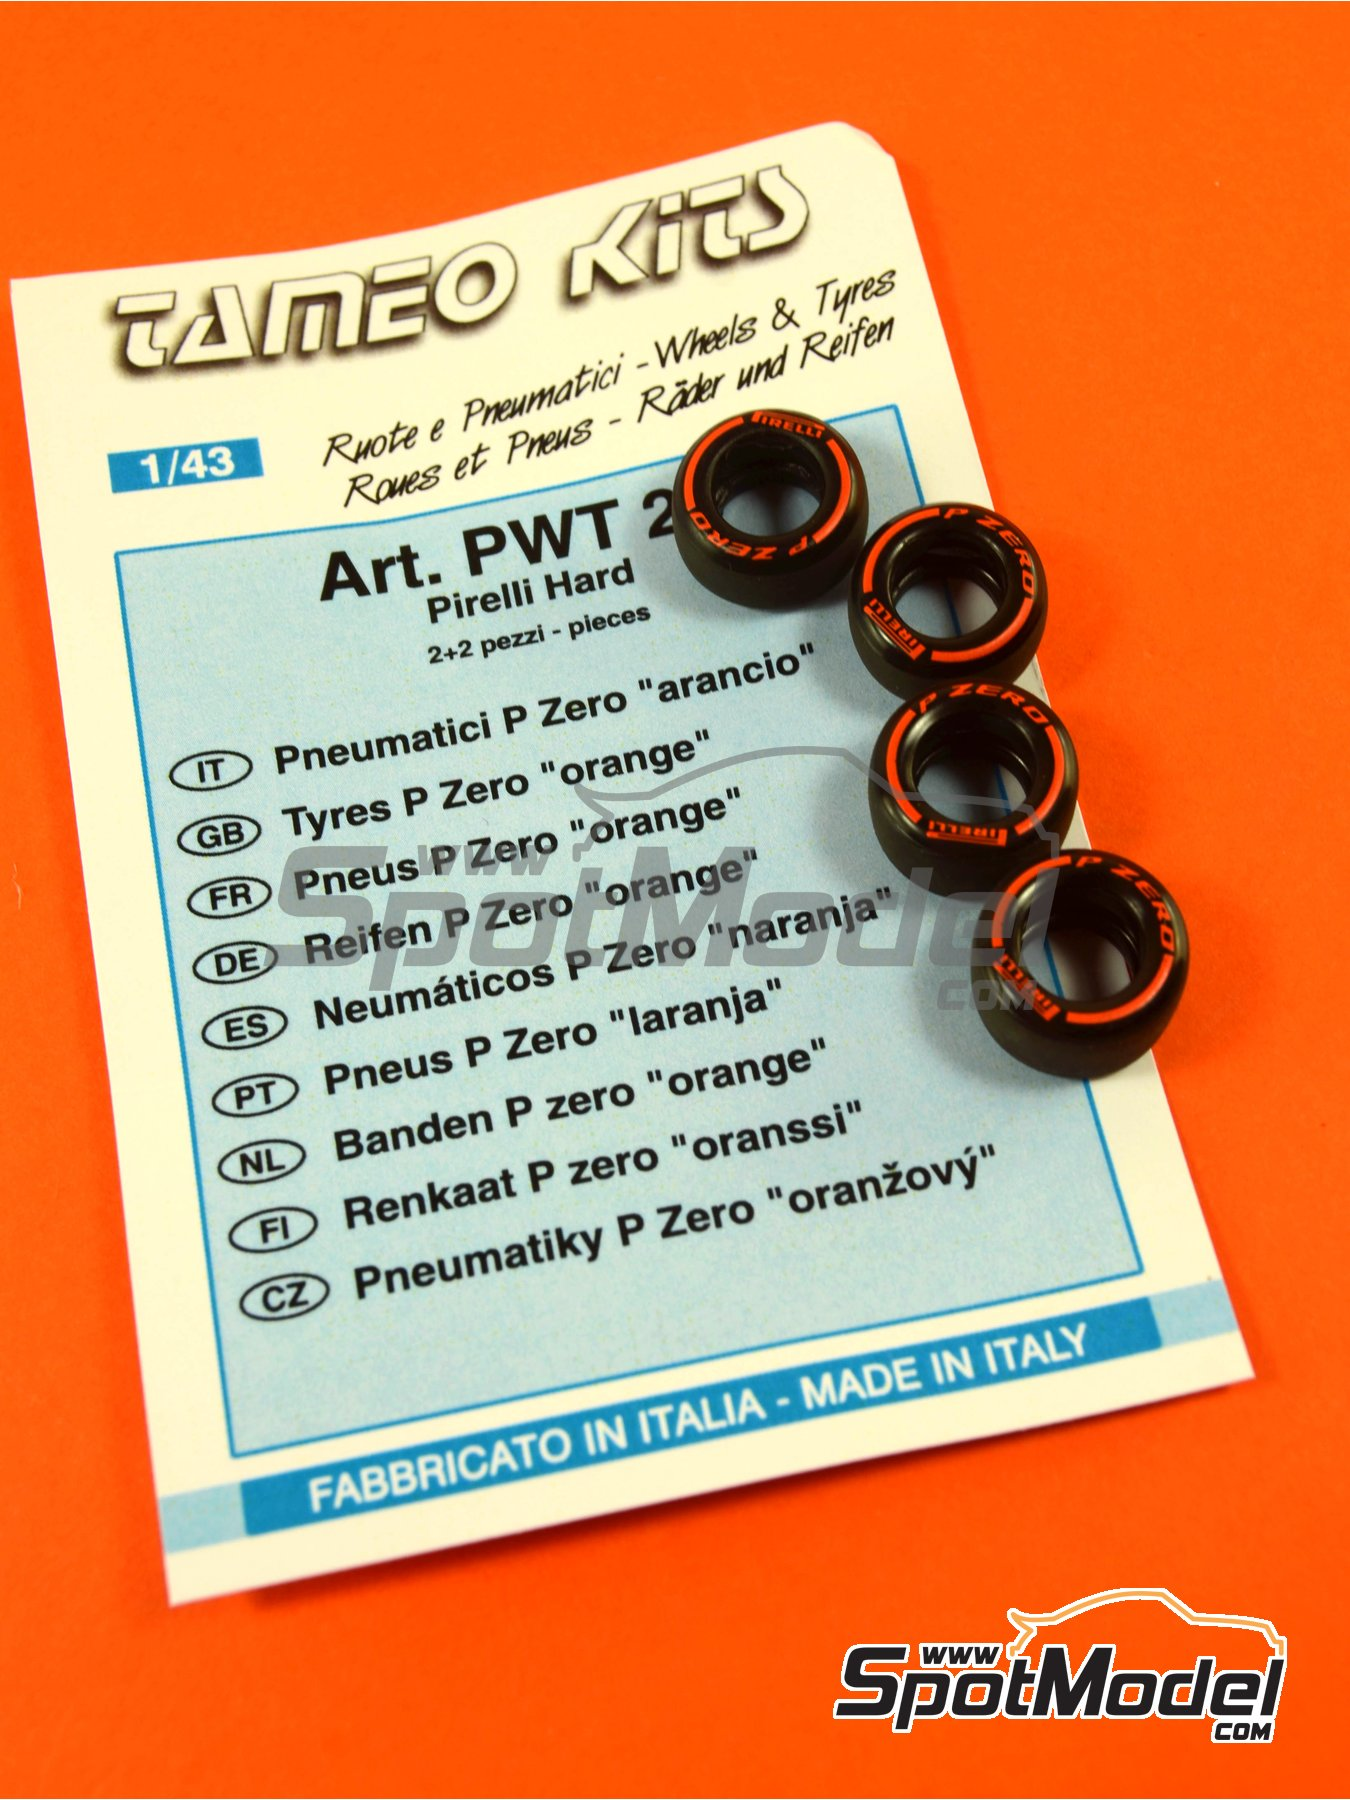 Pirelli P Zero Orange | Tyre set in 1/43 scale manufactured by Tameo Kits (ref.PWT26) image